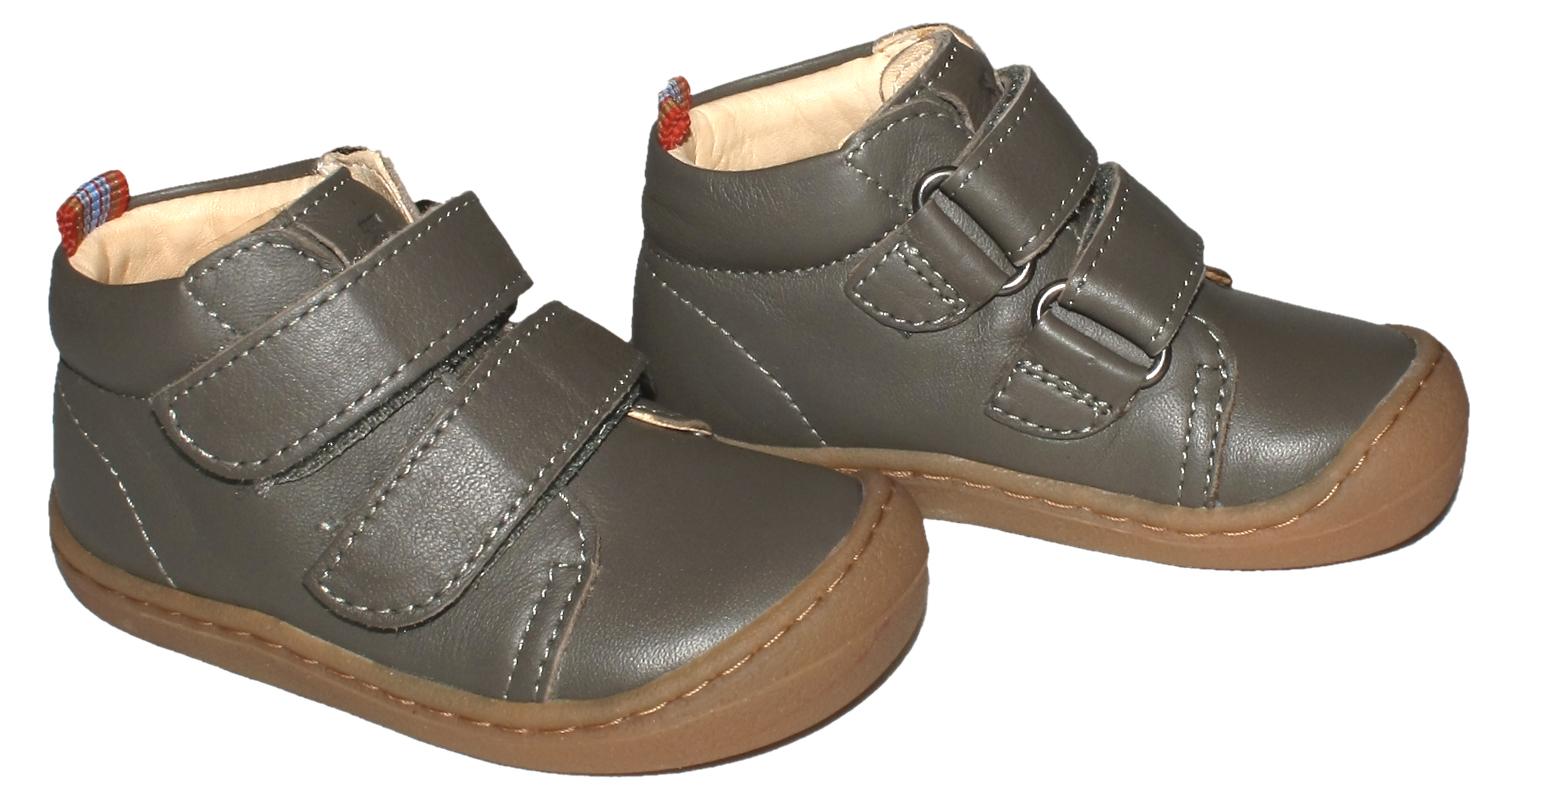 Flexible Bio Leder Schuhe Barfußschuhe in Grau mit Klett von KOEL4KIDS BOB 841